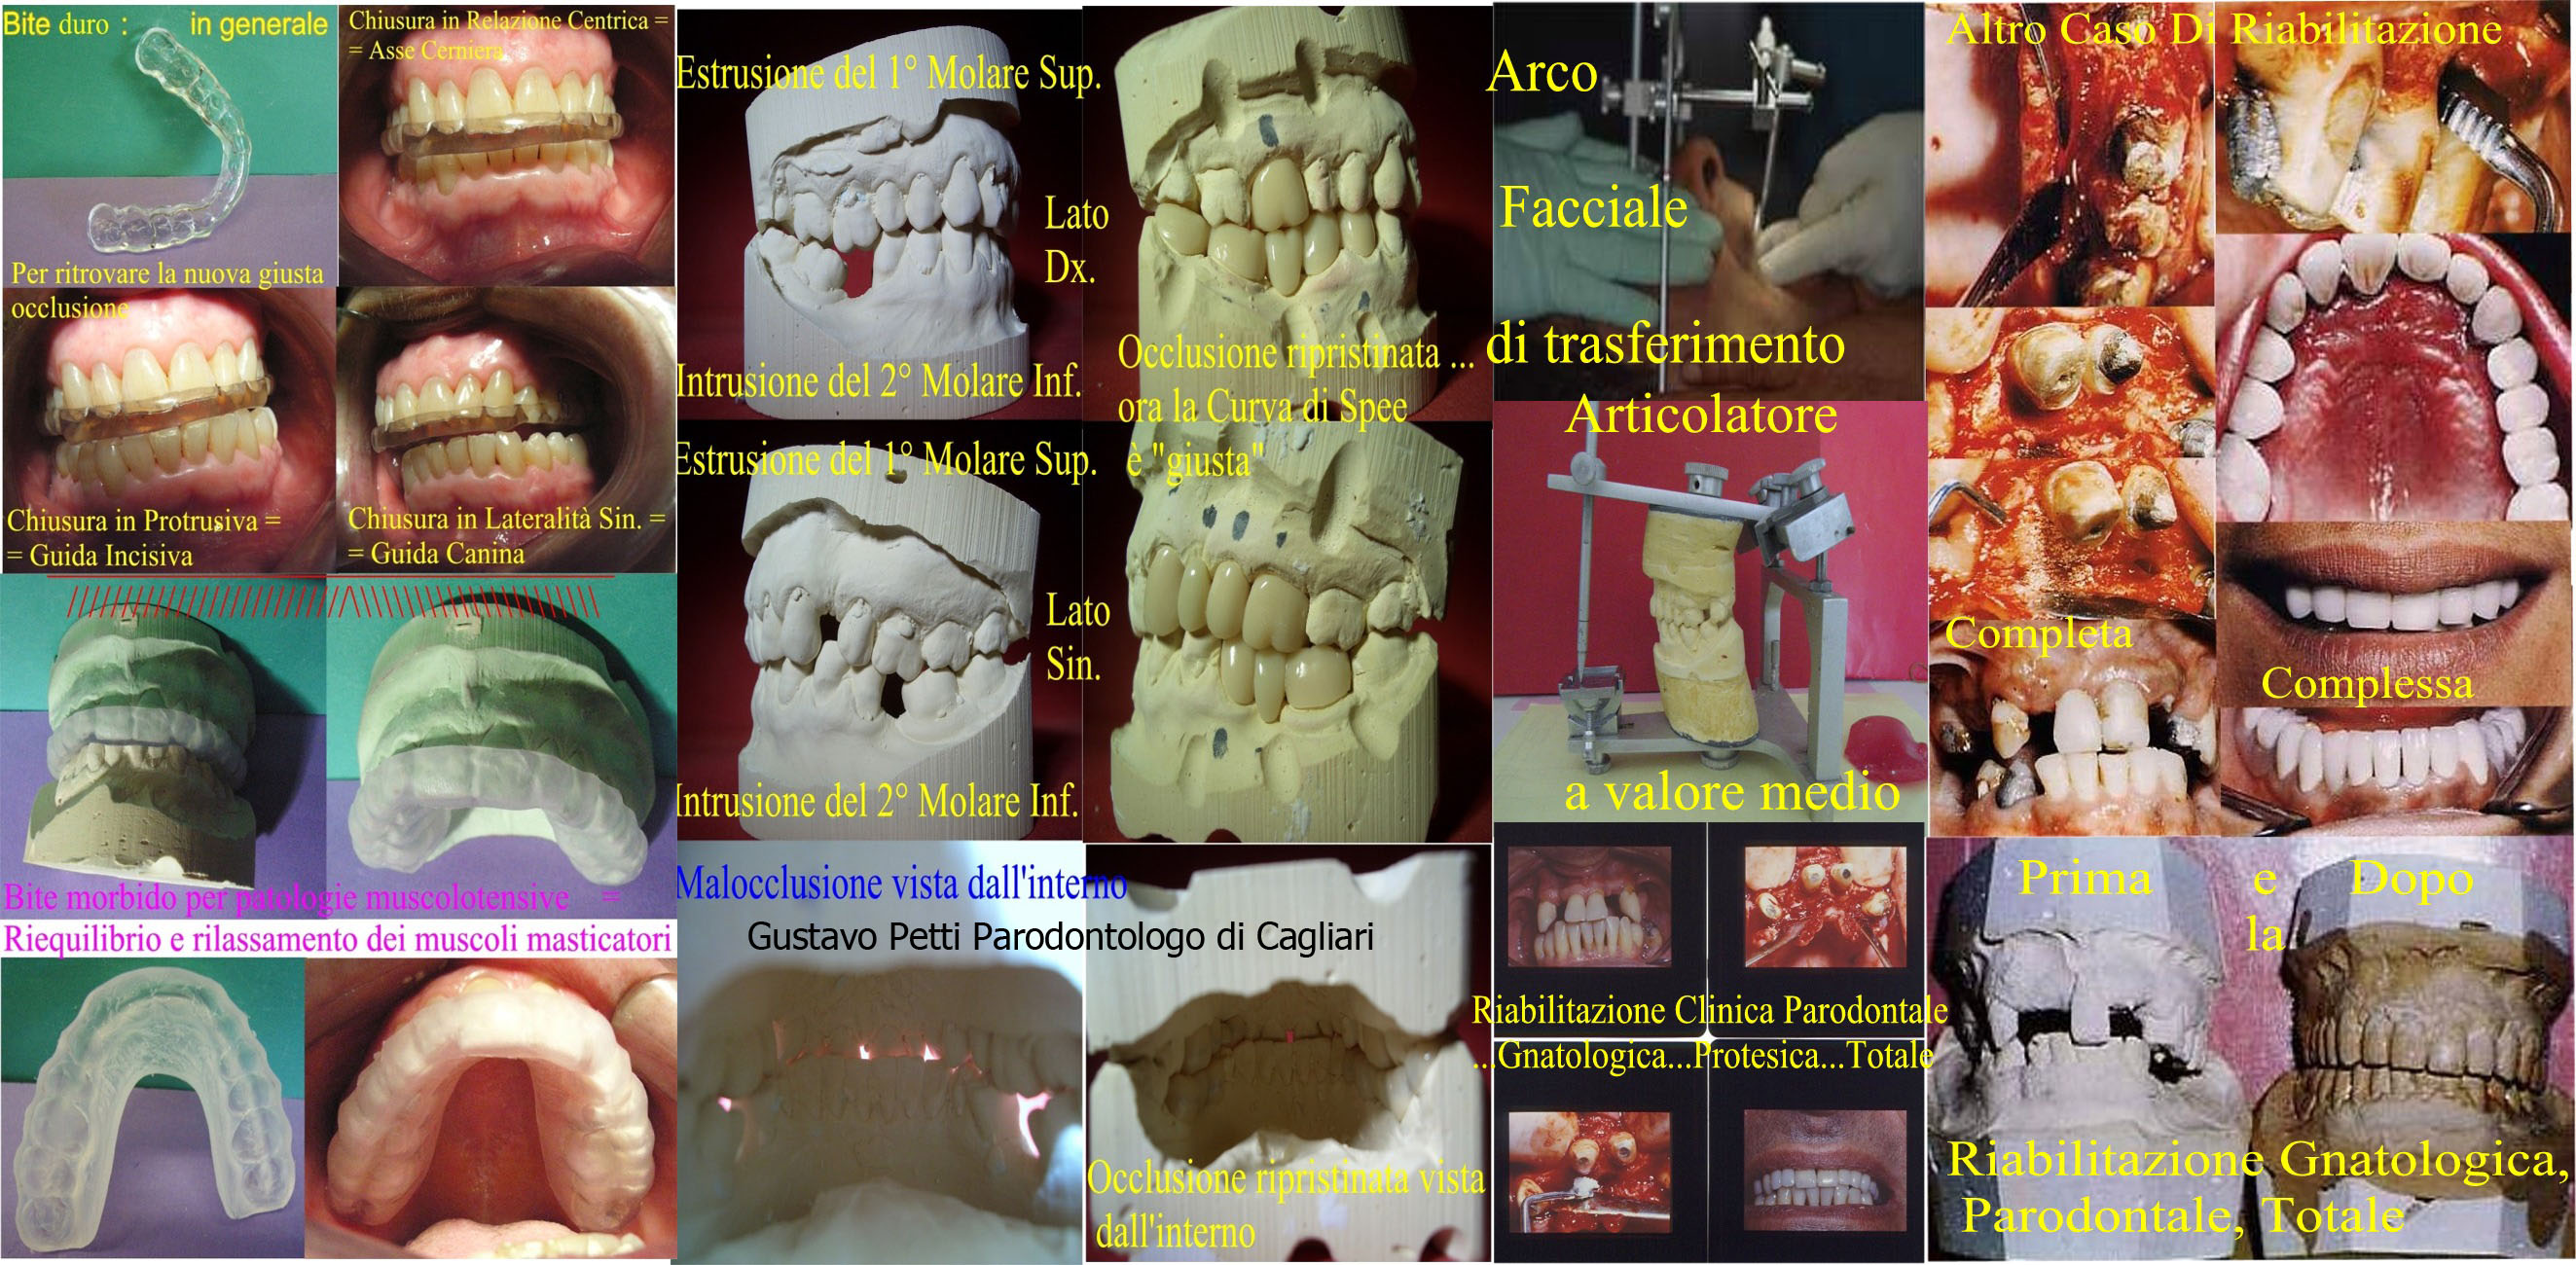 riabilitazione-gnatologica-e-parodontale--241.jpg